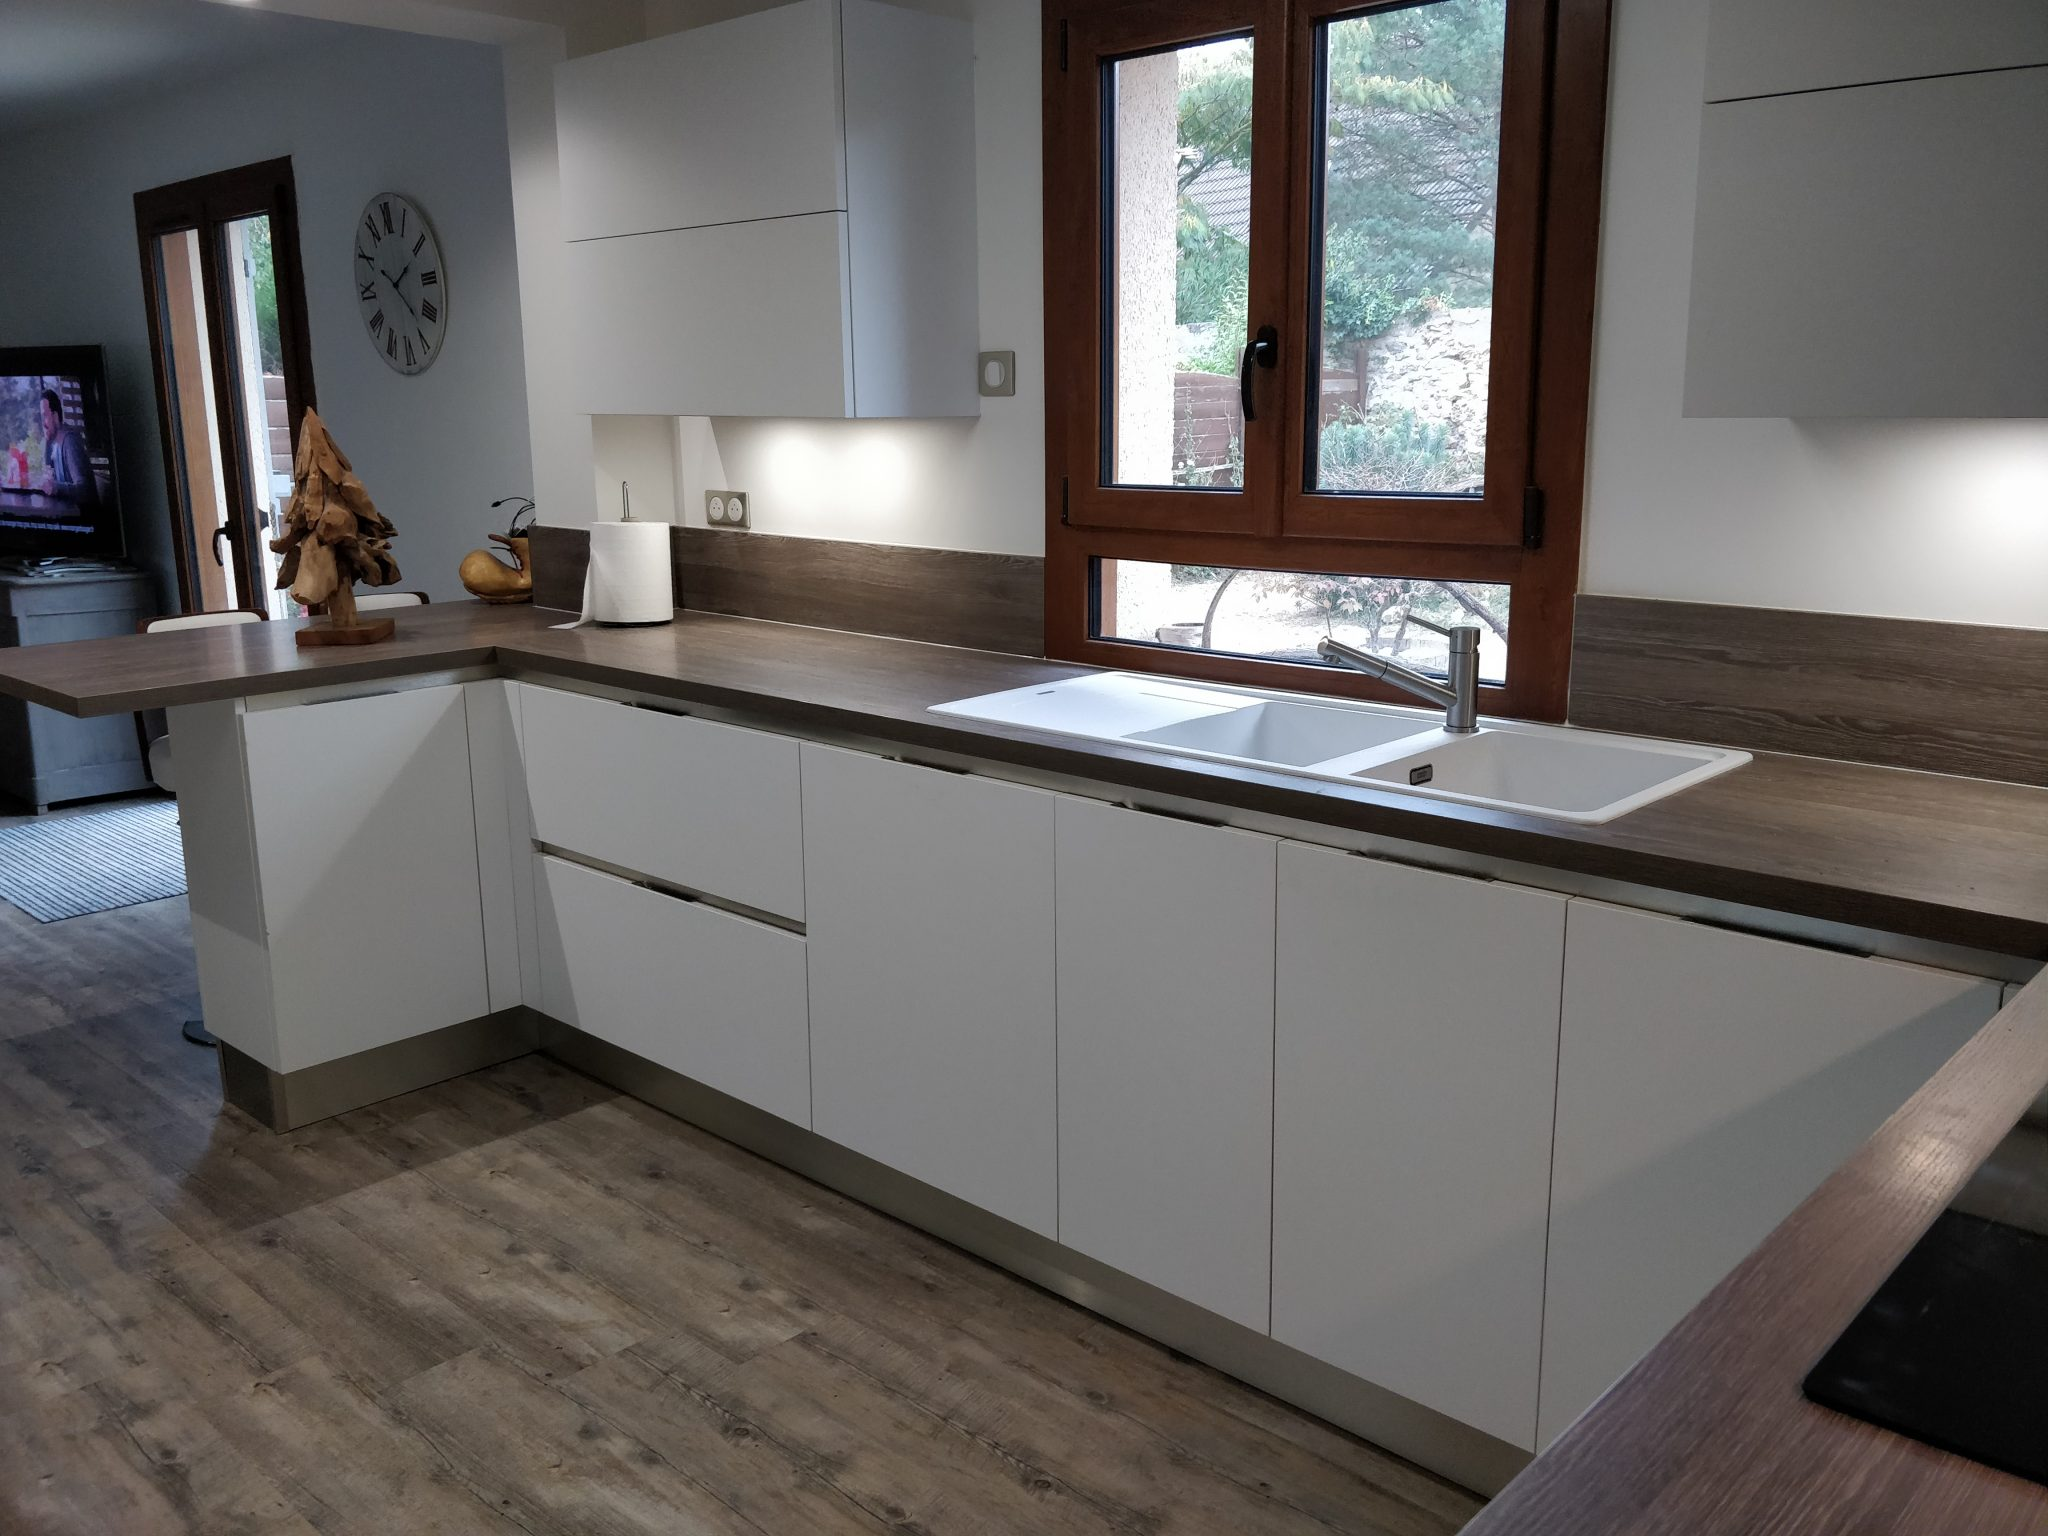 nos r alisations bienvenue chez nathalie yves veneta cucine france. Black Bedroom Furniture Sets. Home Design Ideas